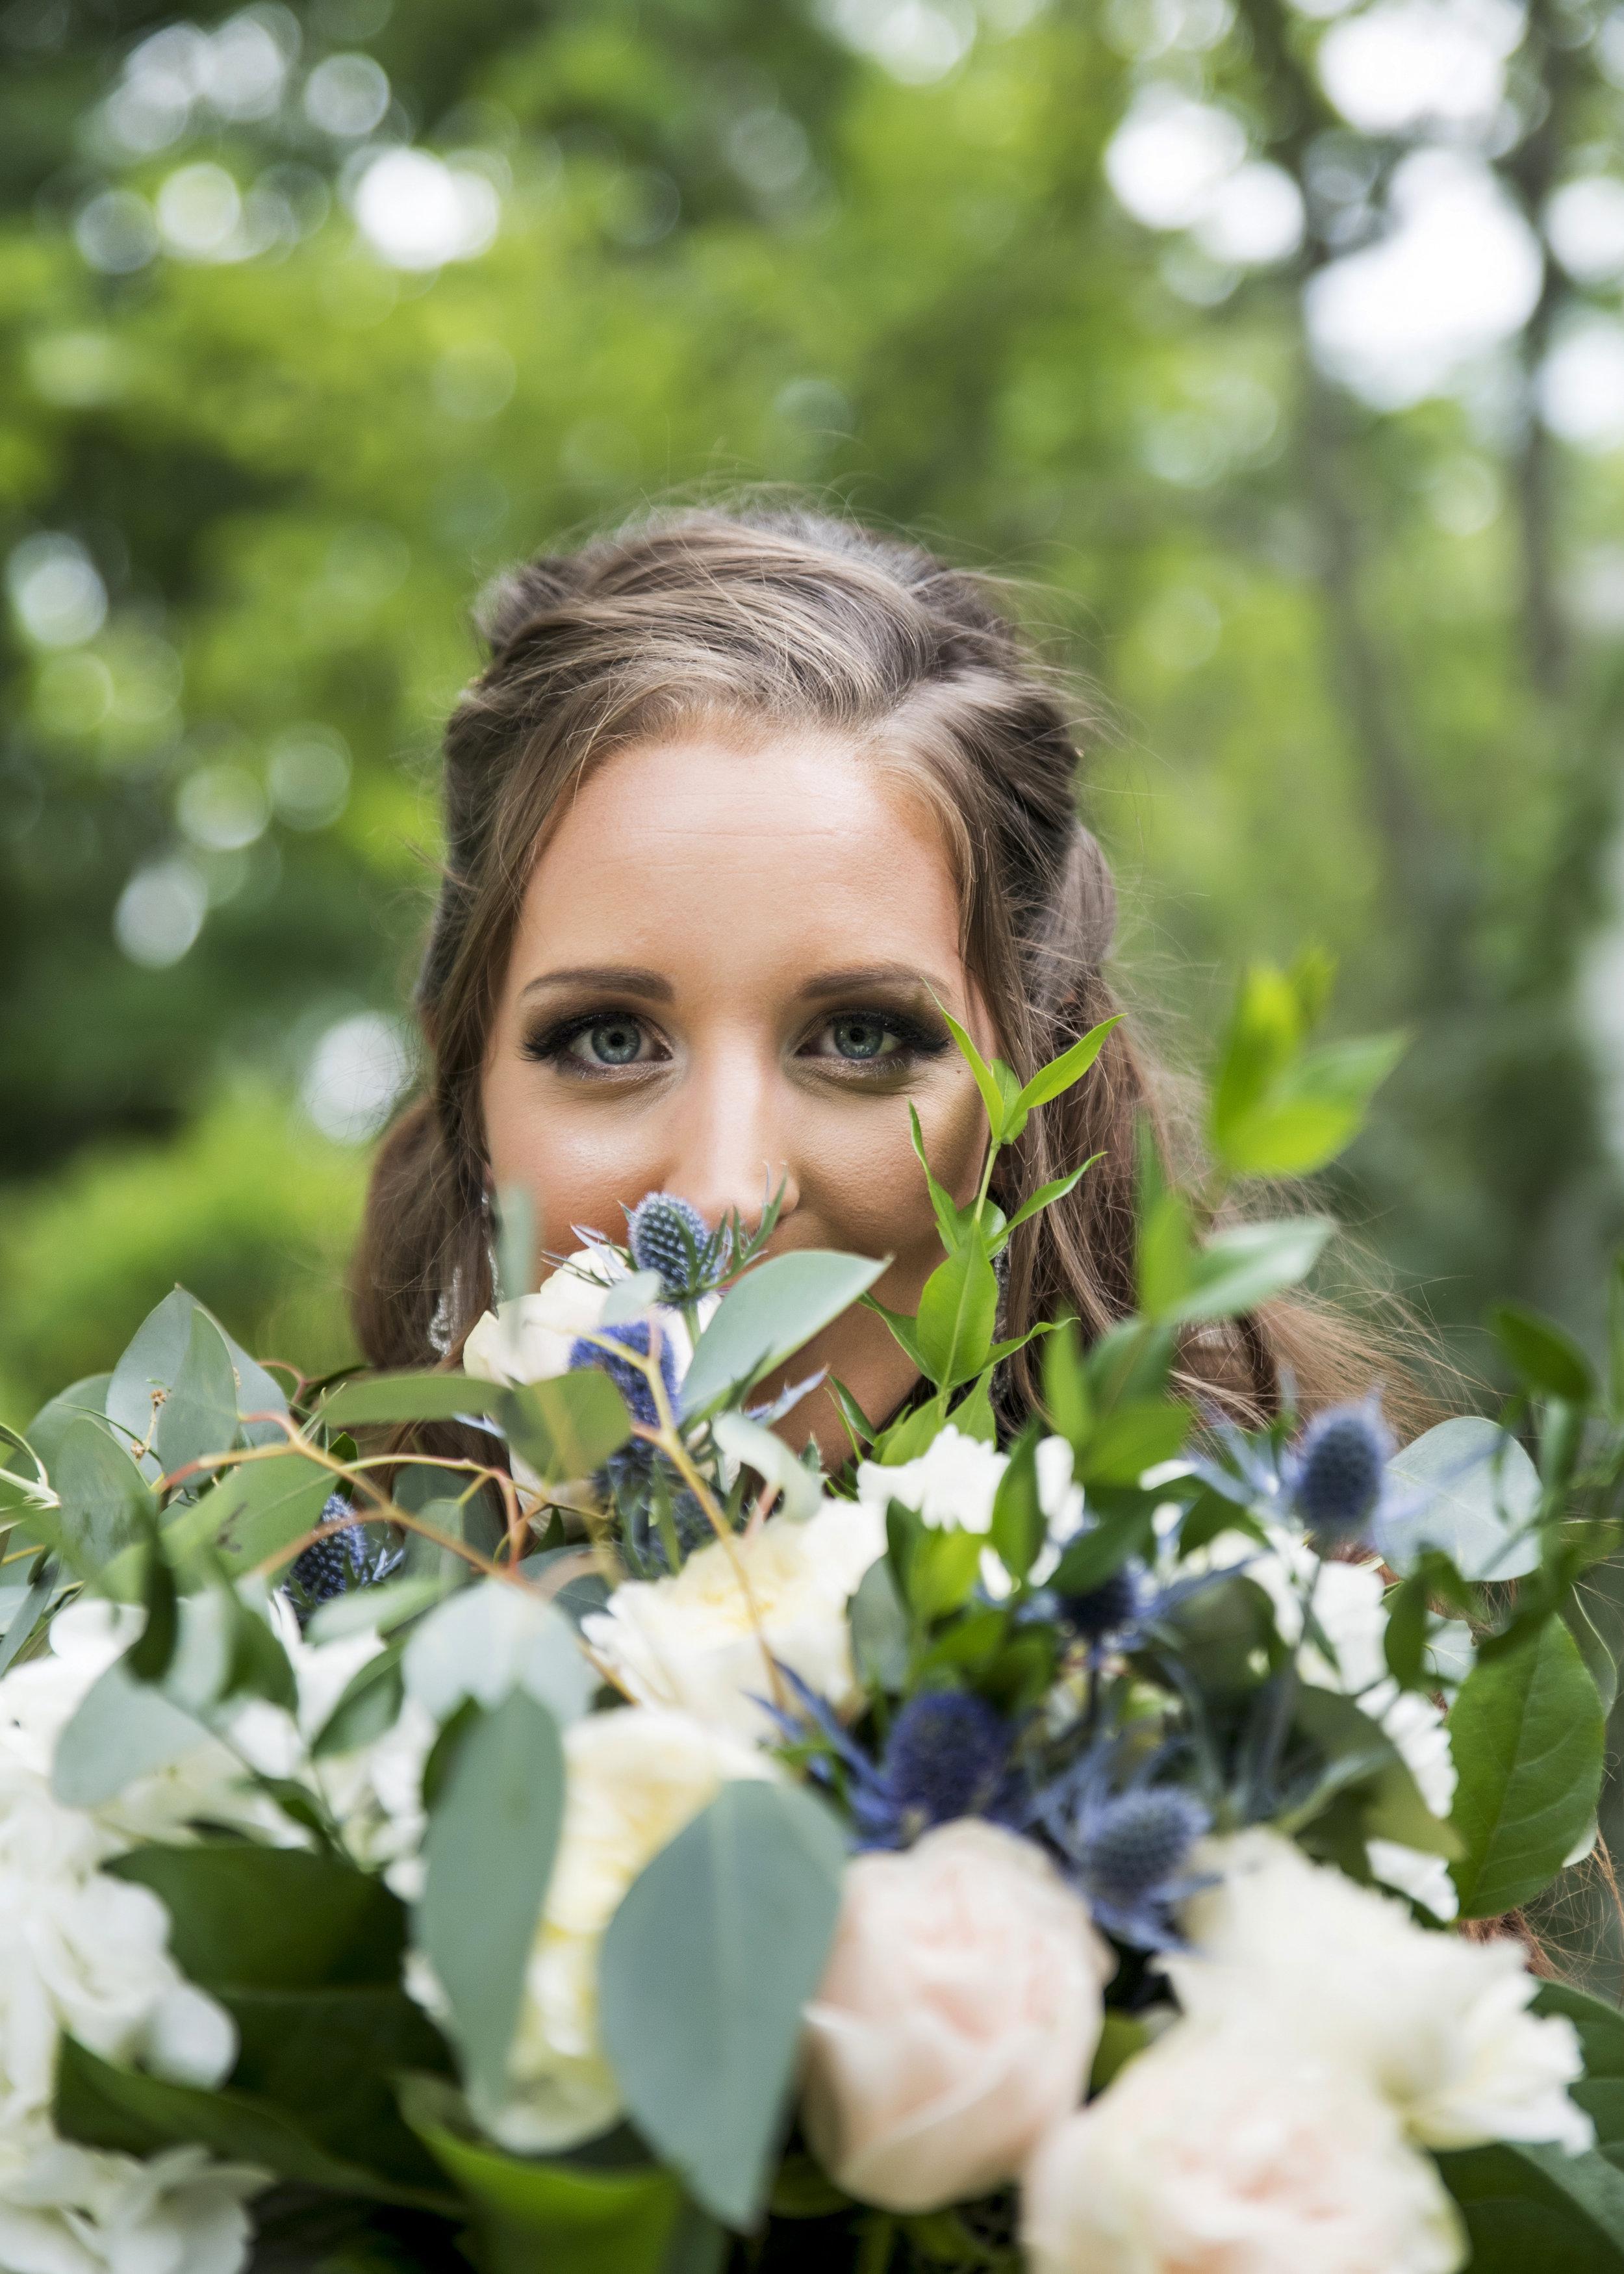 Calvin-wedding-chandelier-grove-tomball-tx-ashleigh-rodriguez-photography-219 copy.jpg